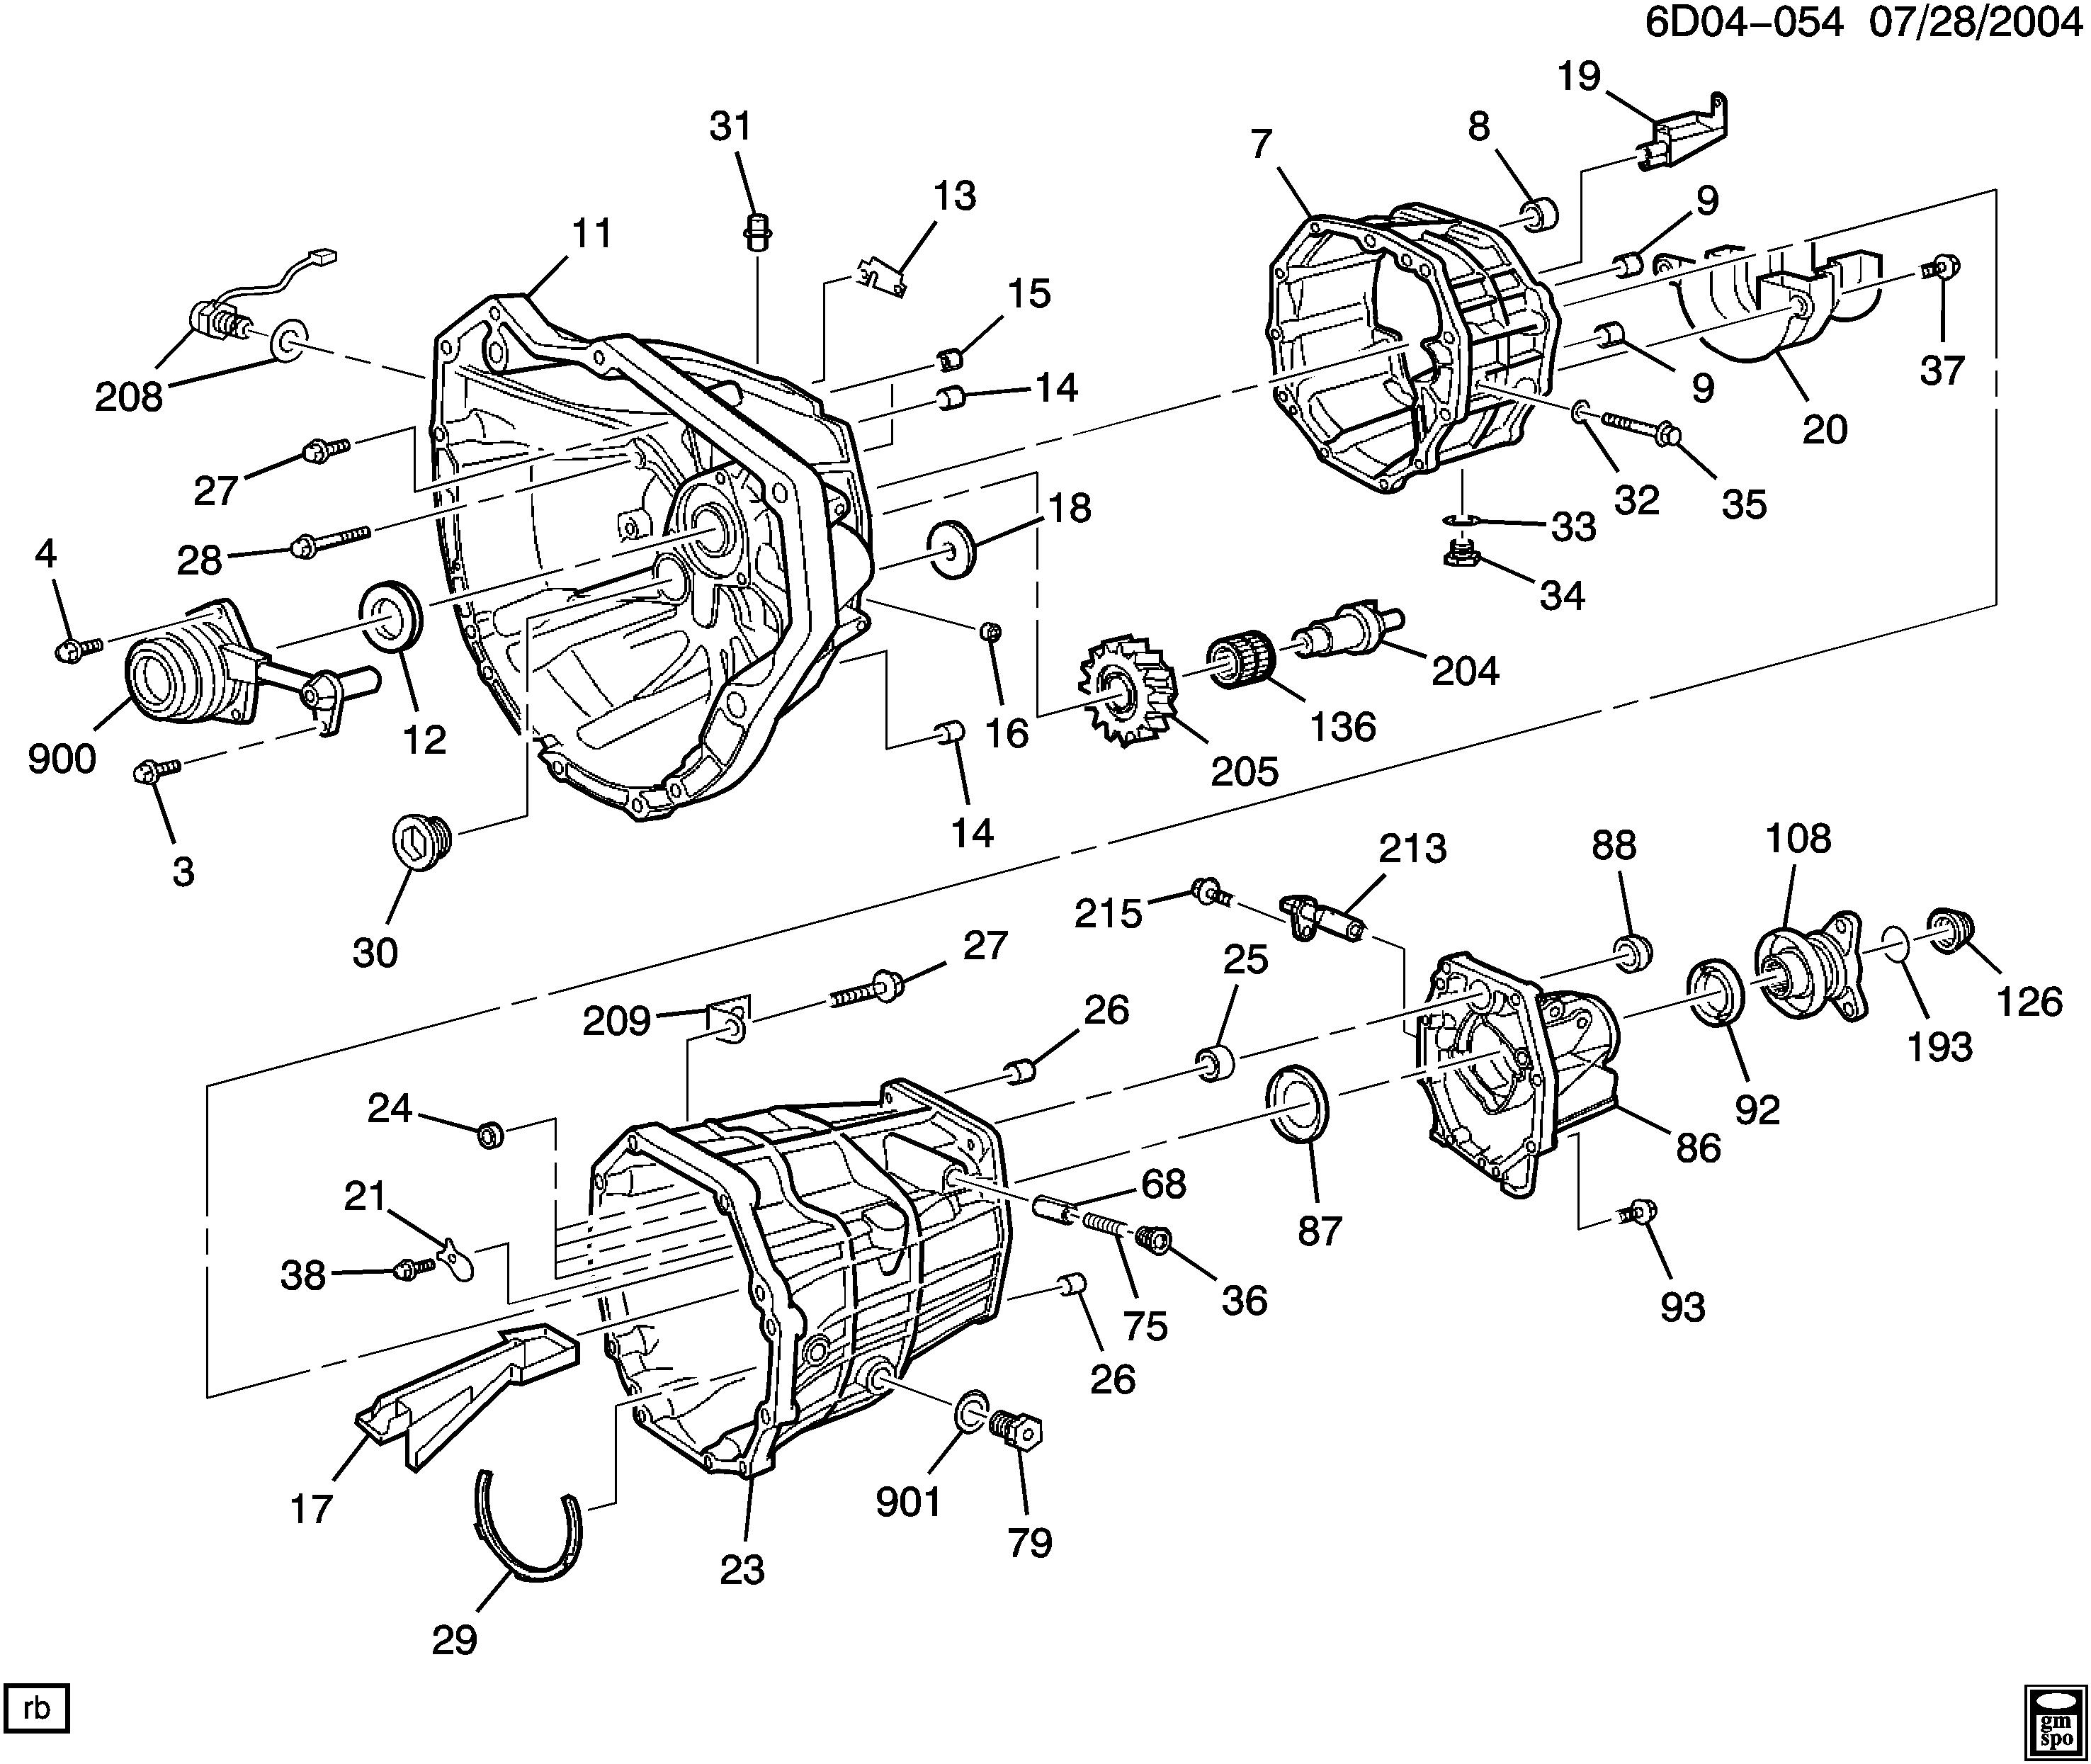 Cadillac CTS / Spare parts catalog EPC